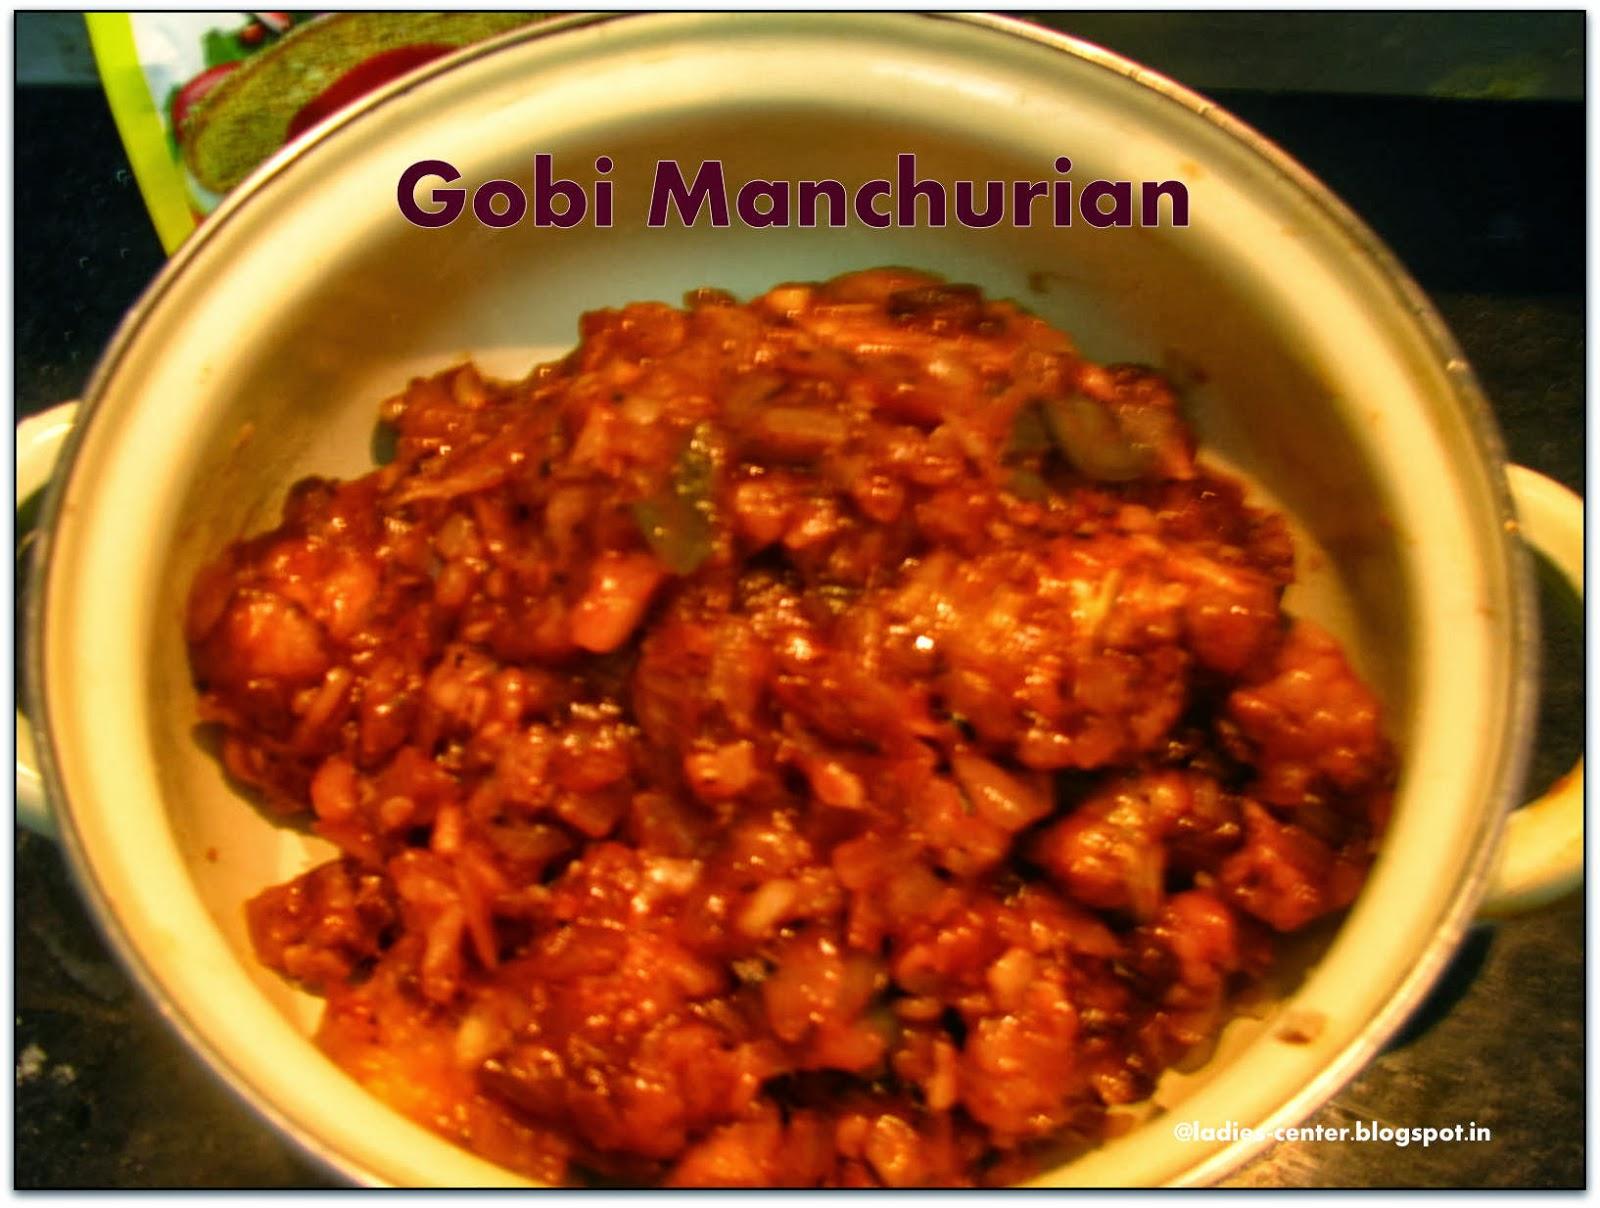 Gobi manchurian recipe how to make gobi manchurian dry and gravy how to make gobi manchurian gobi manchurian dry and gobi manchurian gravy recipe forumfinder Gallery